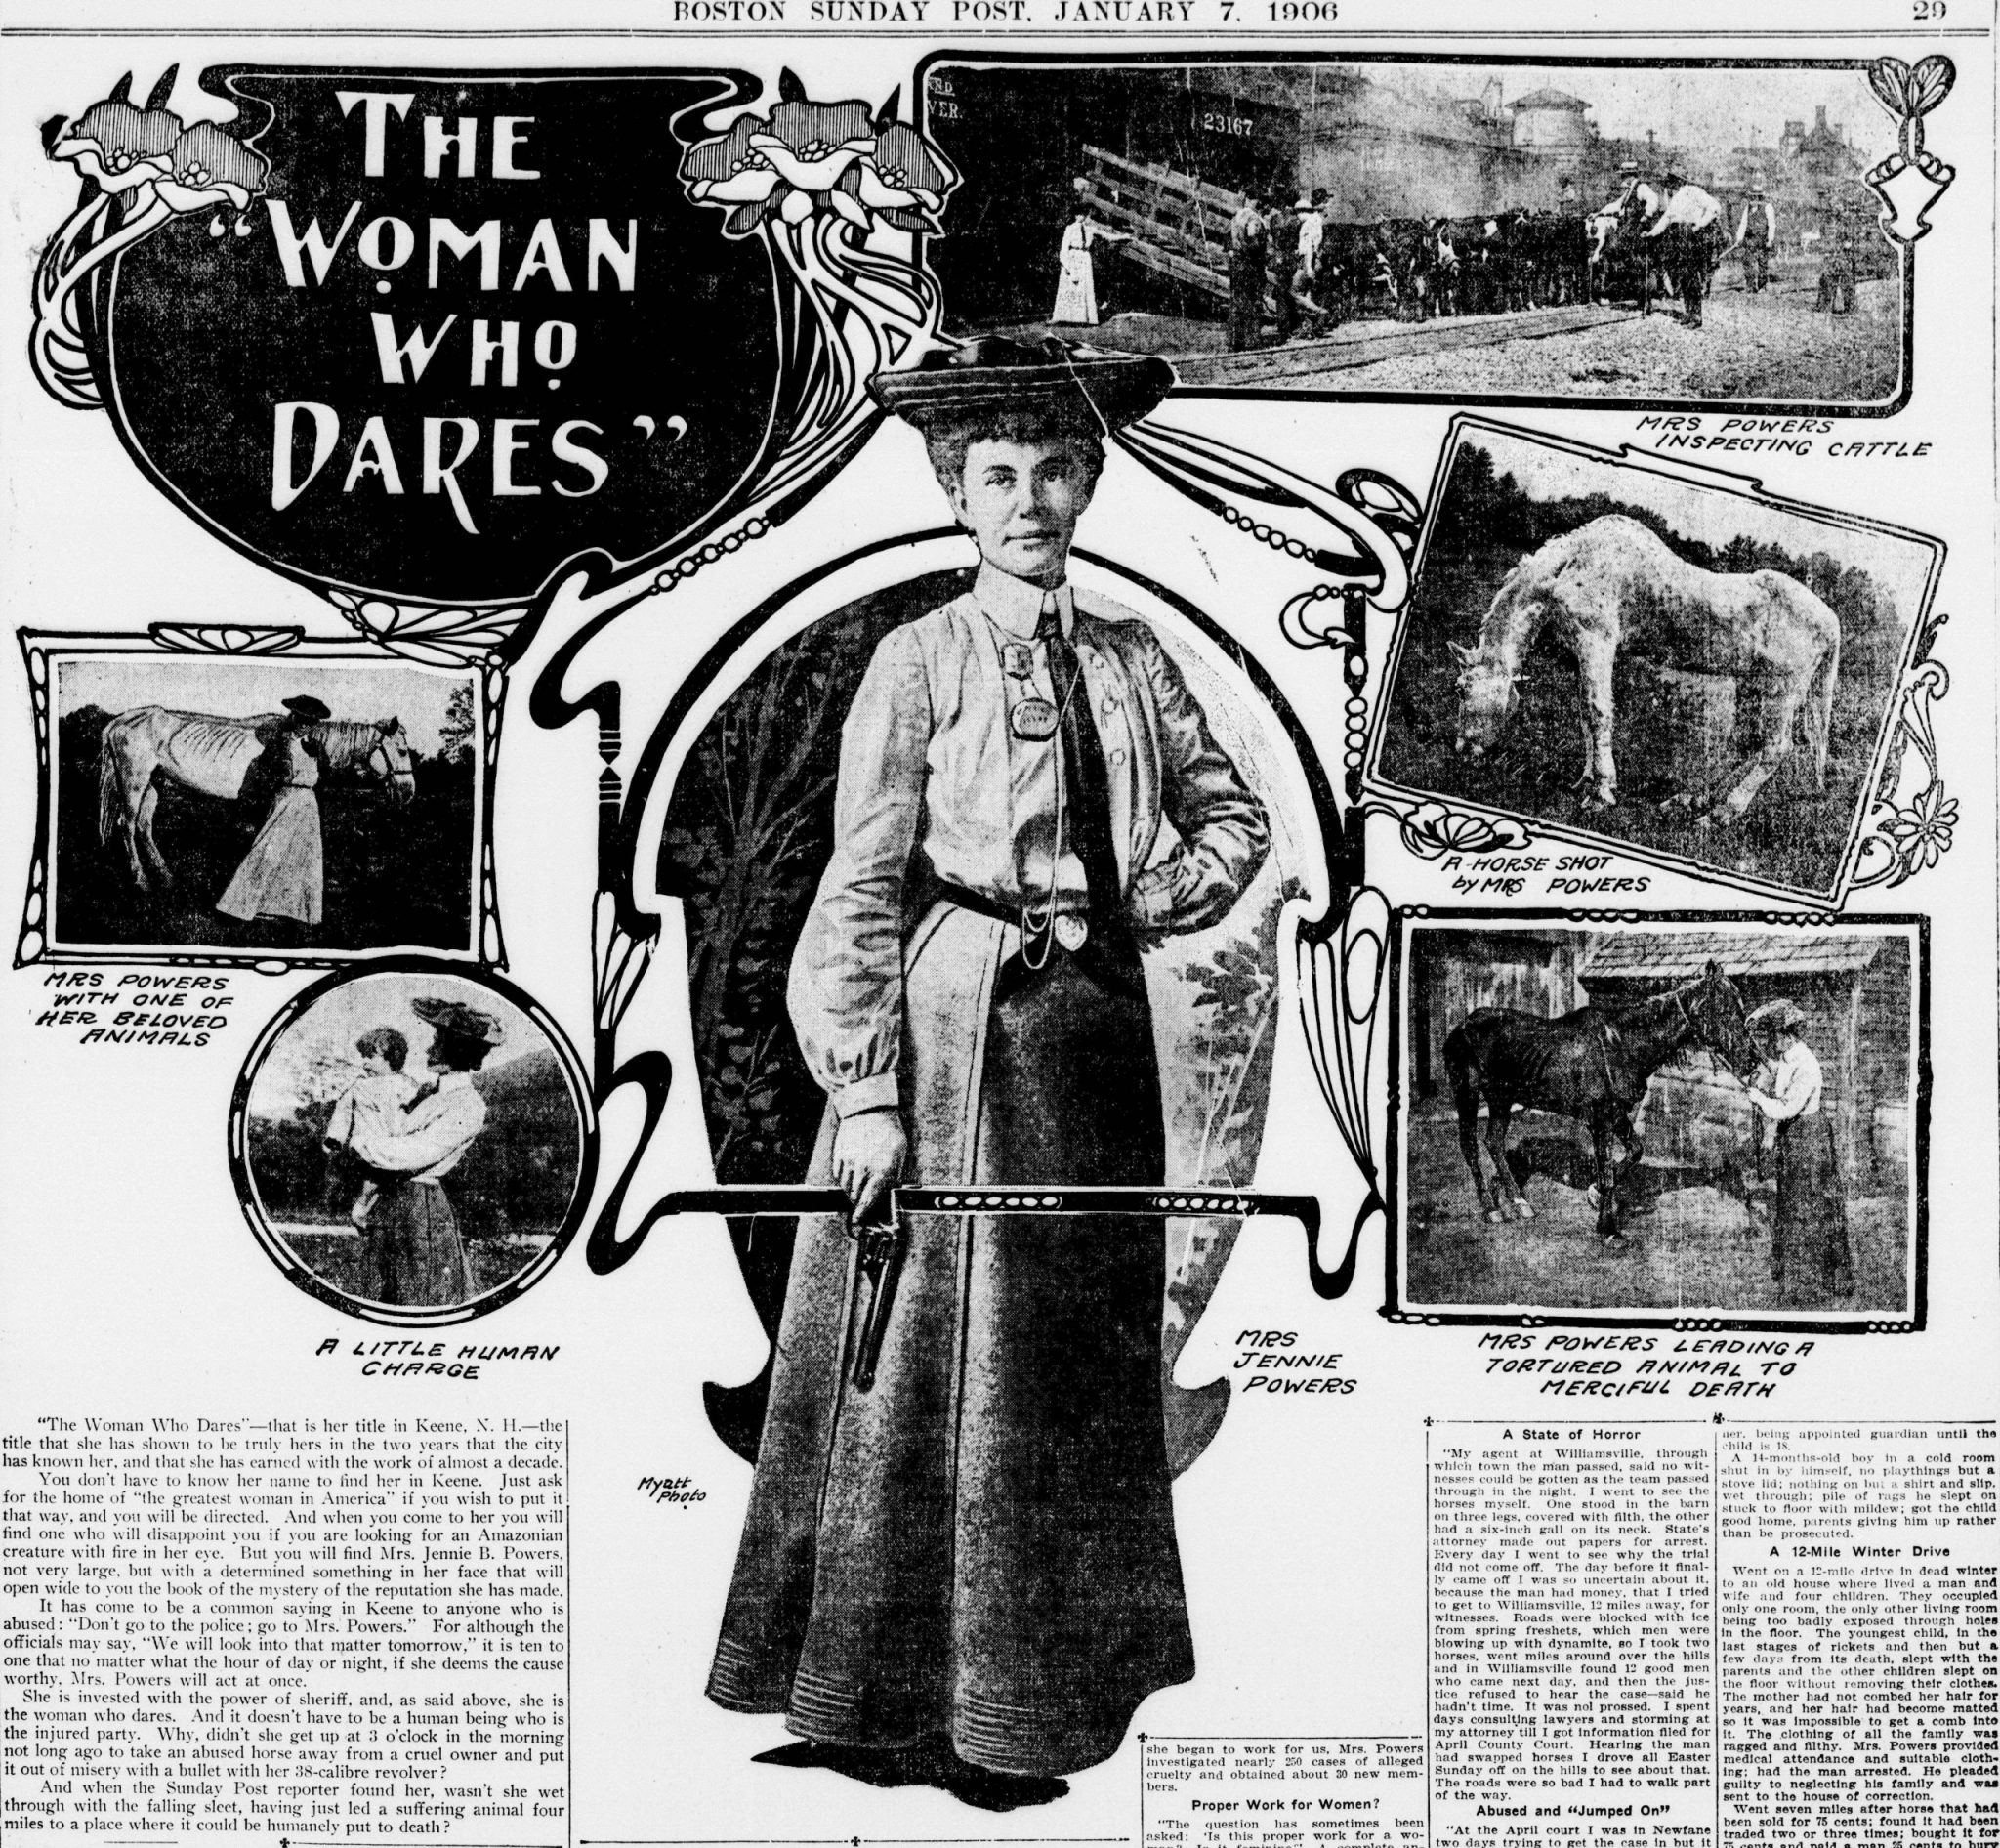 Jennie Powers black and white print advertisement.